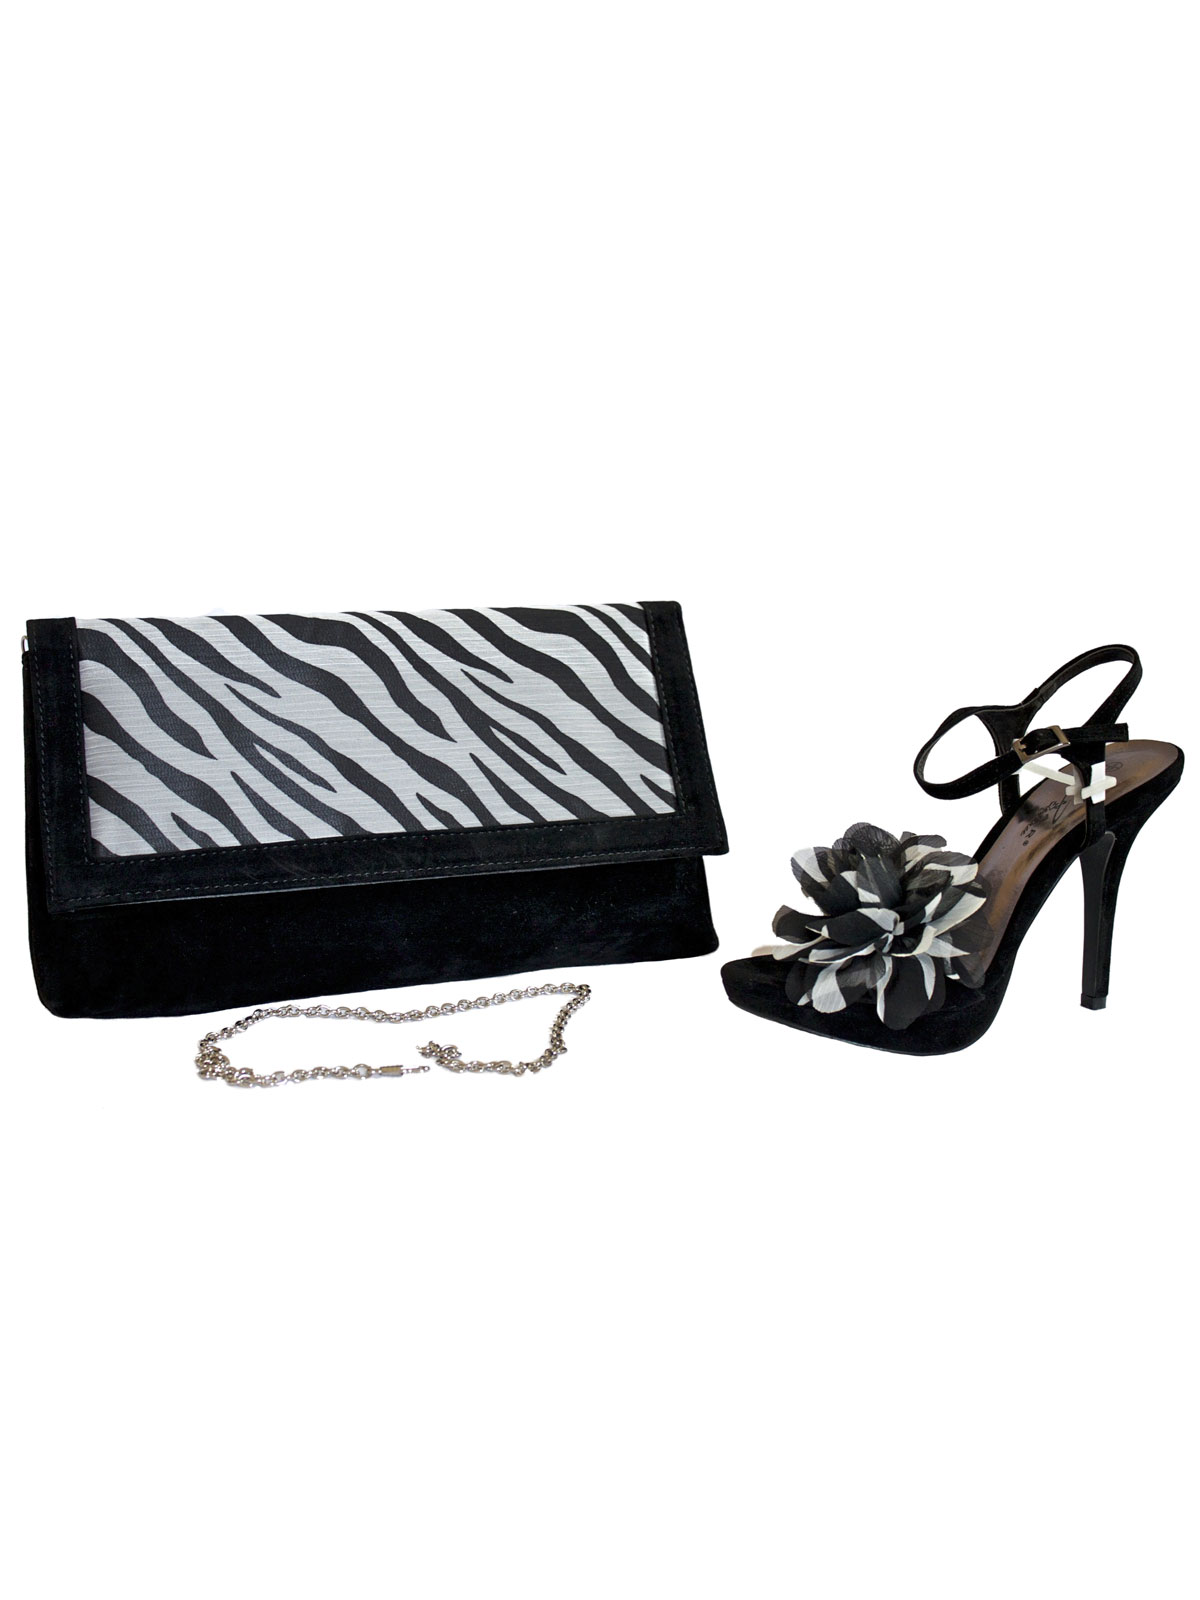 Lunar Black White Stiletto Slingbacks and Bag